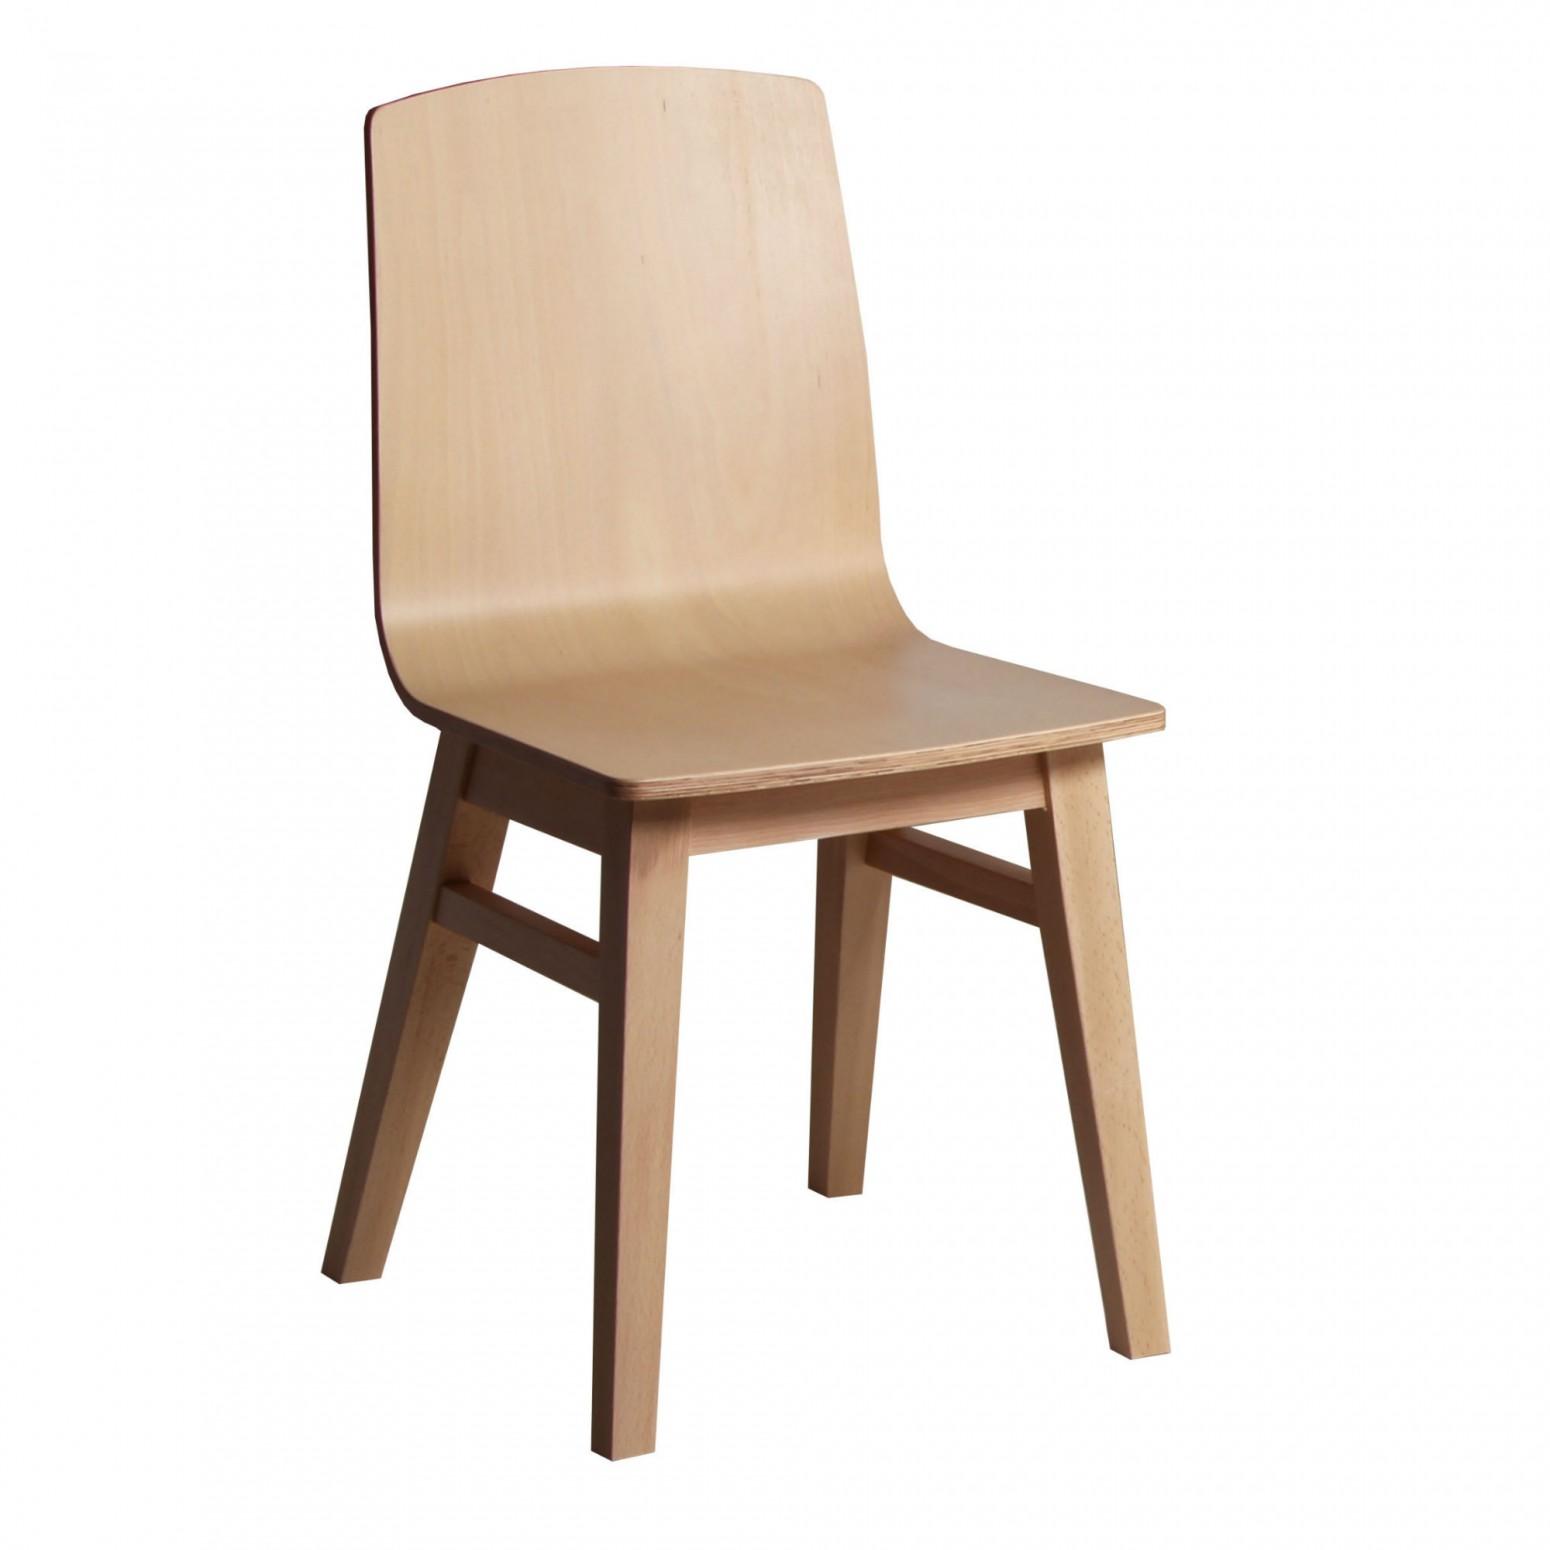 chaise moderne en bois massif